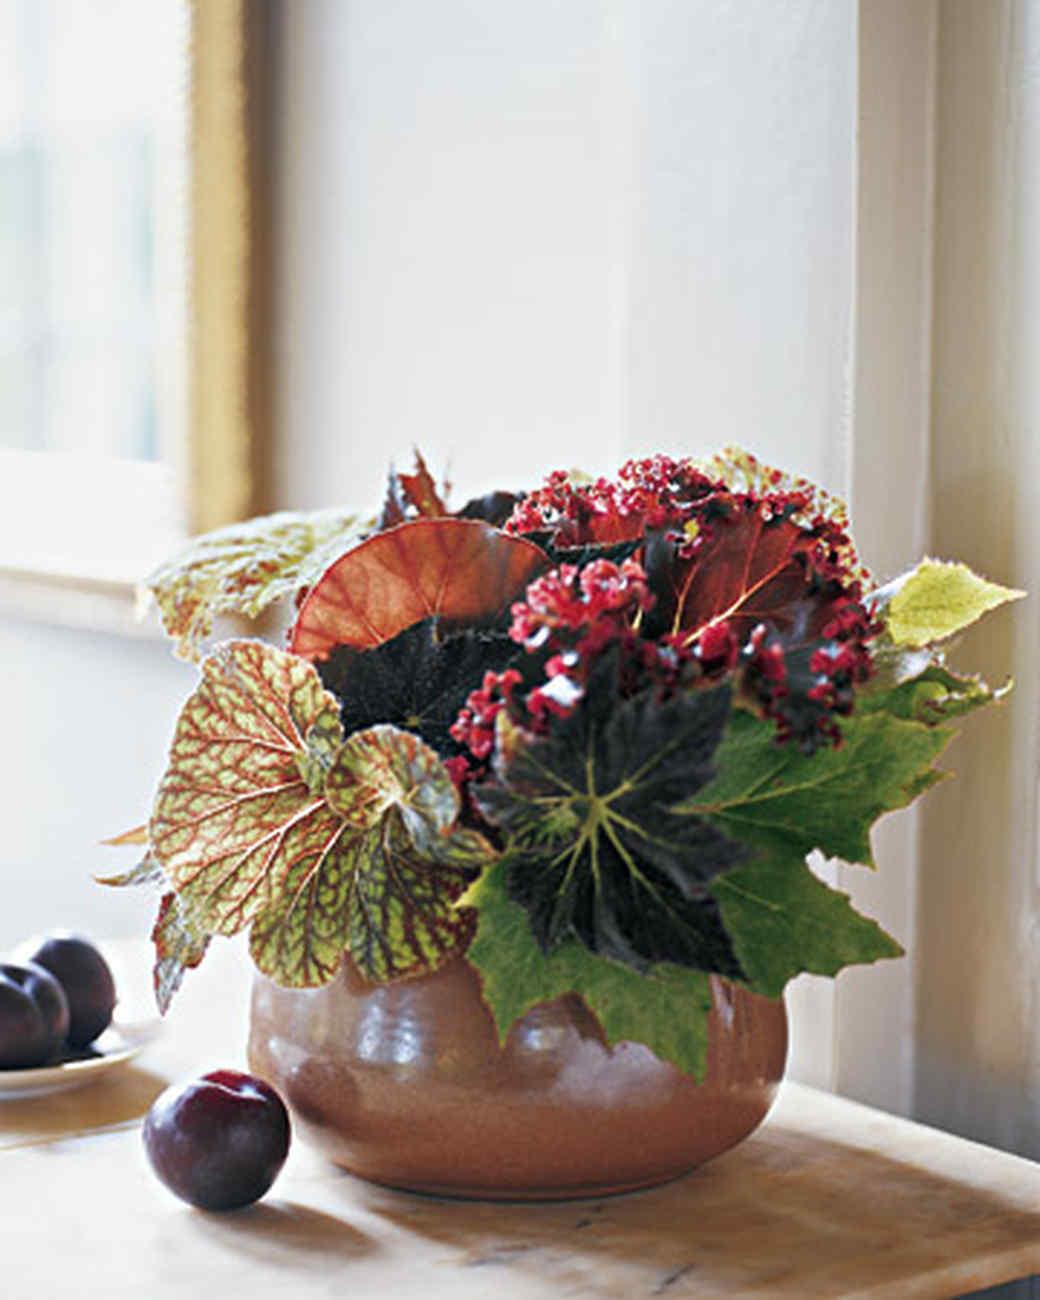 15 Famous Goblet Vase Flower Arrangements 2021 free download goblet vase flower arrangements of marthas flower arranging secrets martha stewart regarding lesson 2